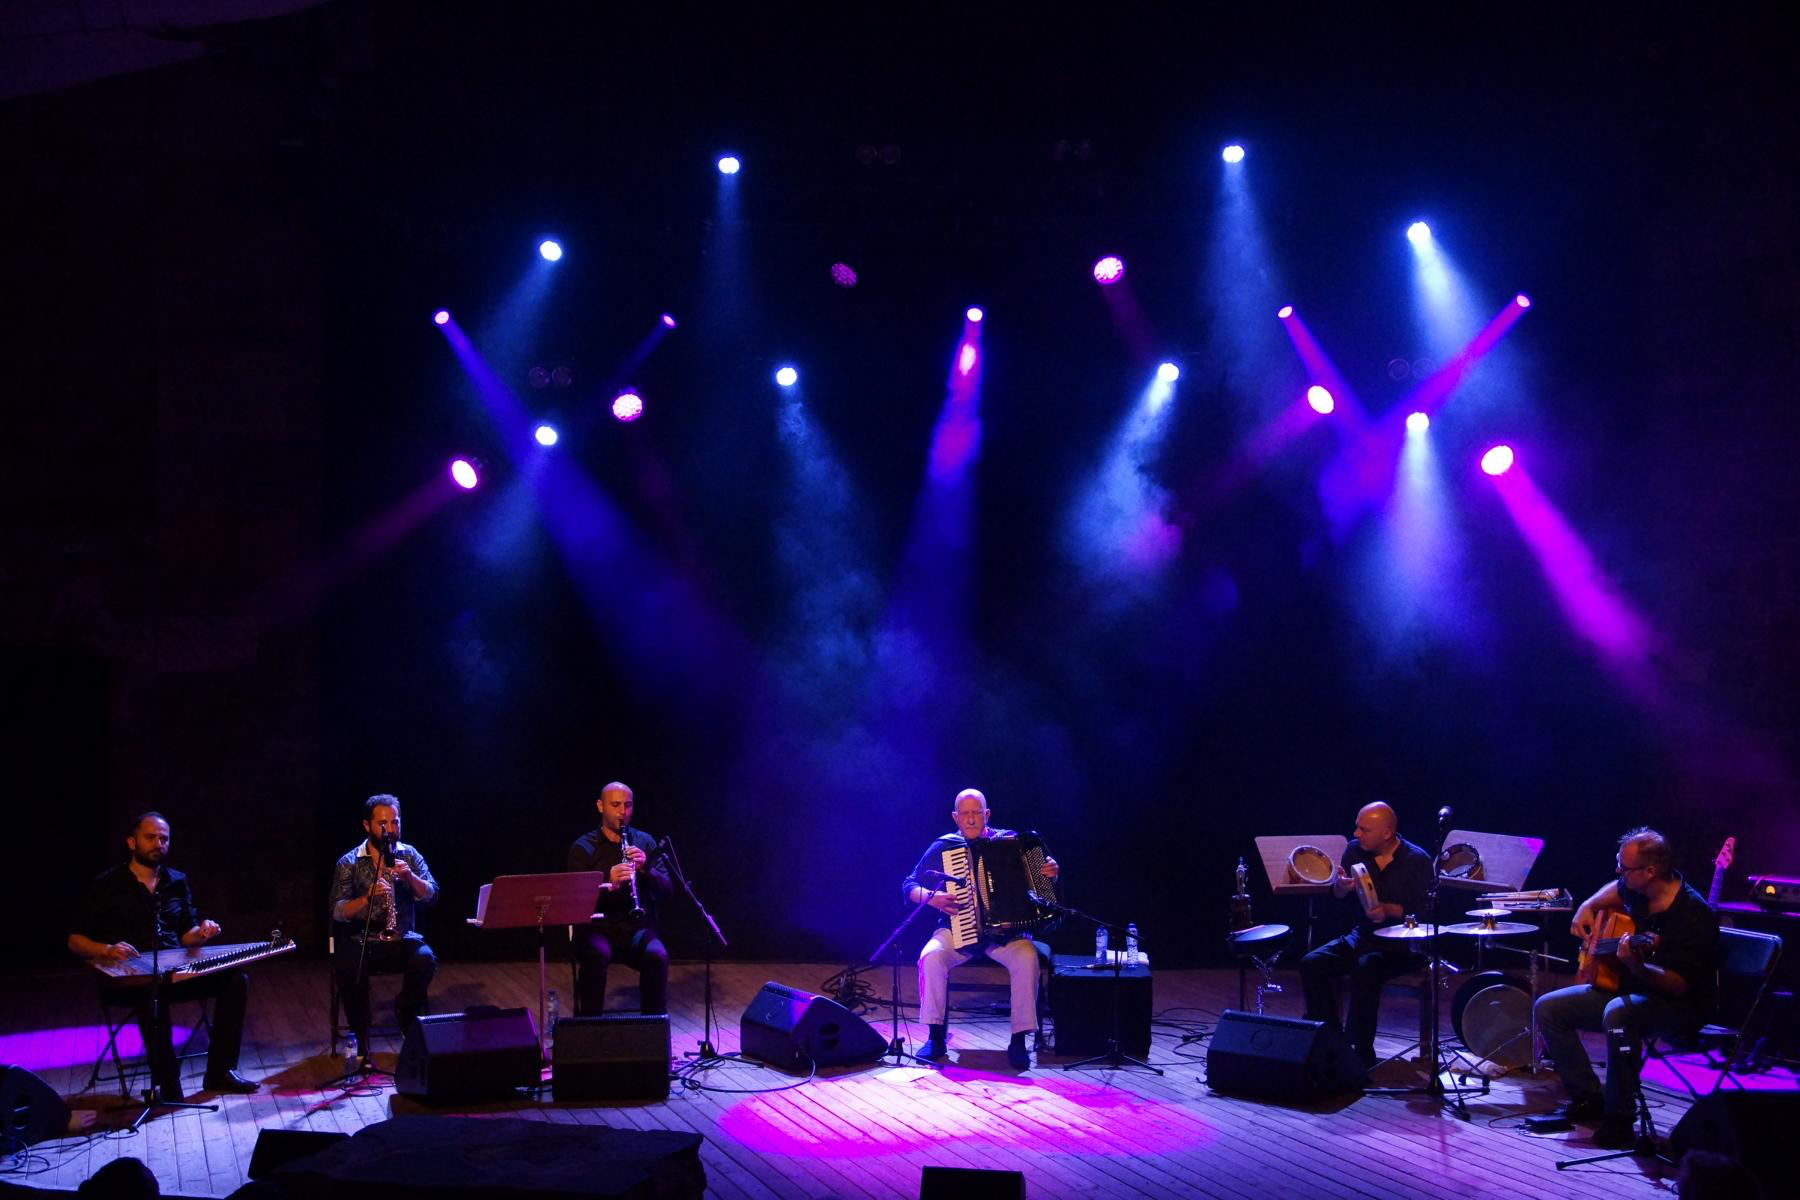 Mit Feras Sharestan, Basel Rajoub, Mohamed Najem Andrea Piccioni, Antoine Pütz, Burg Wilhelmstein